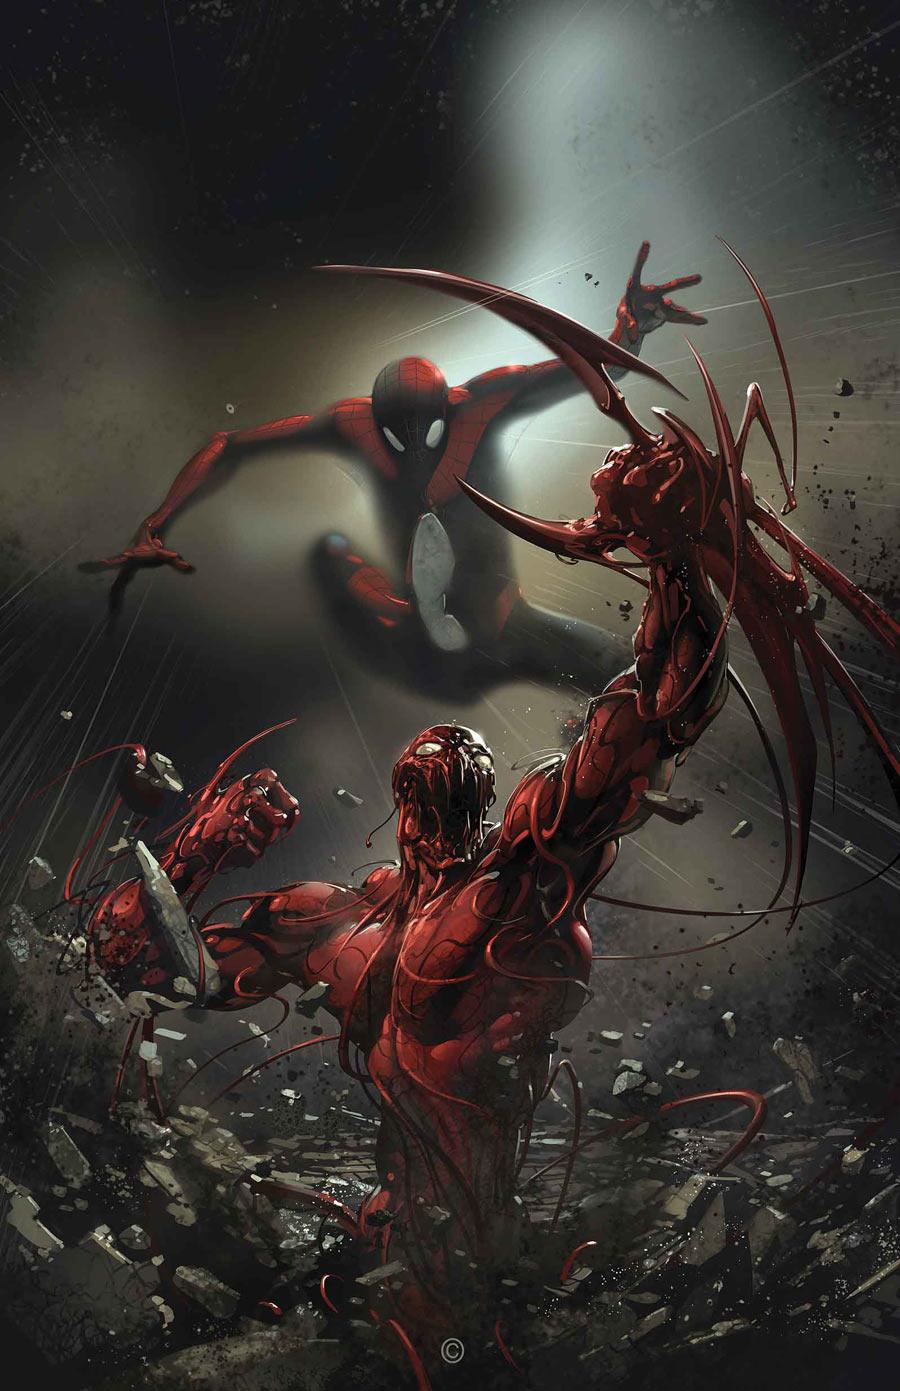 Superior Carnage Vol 1 4 - Marvel Comics Database